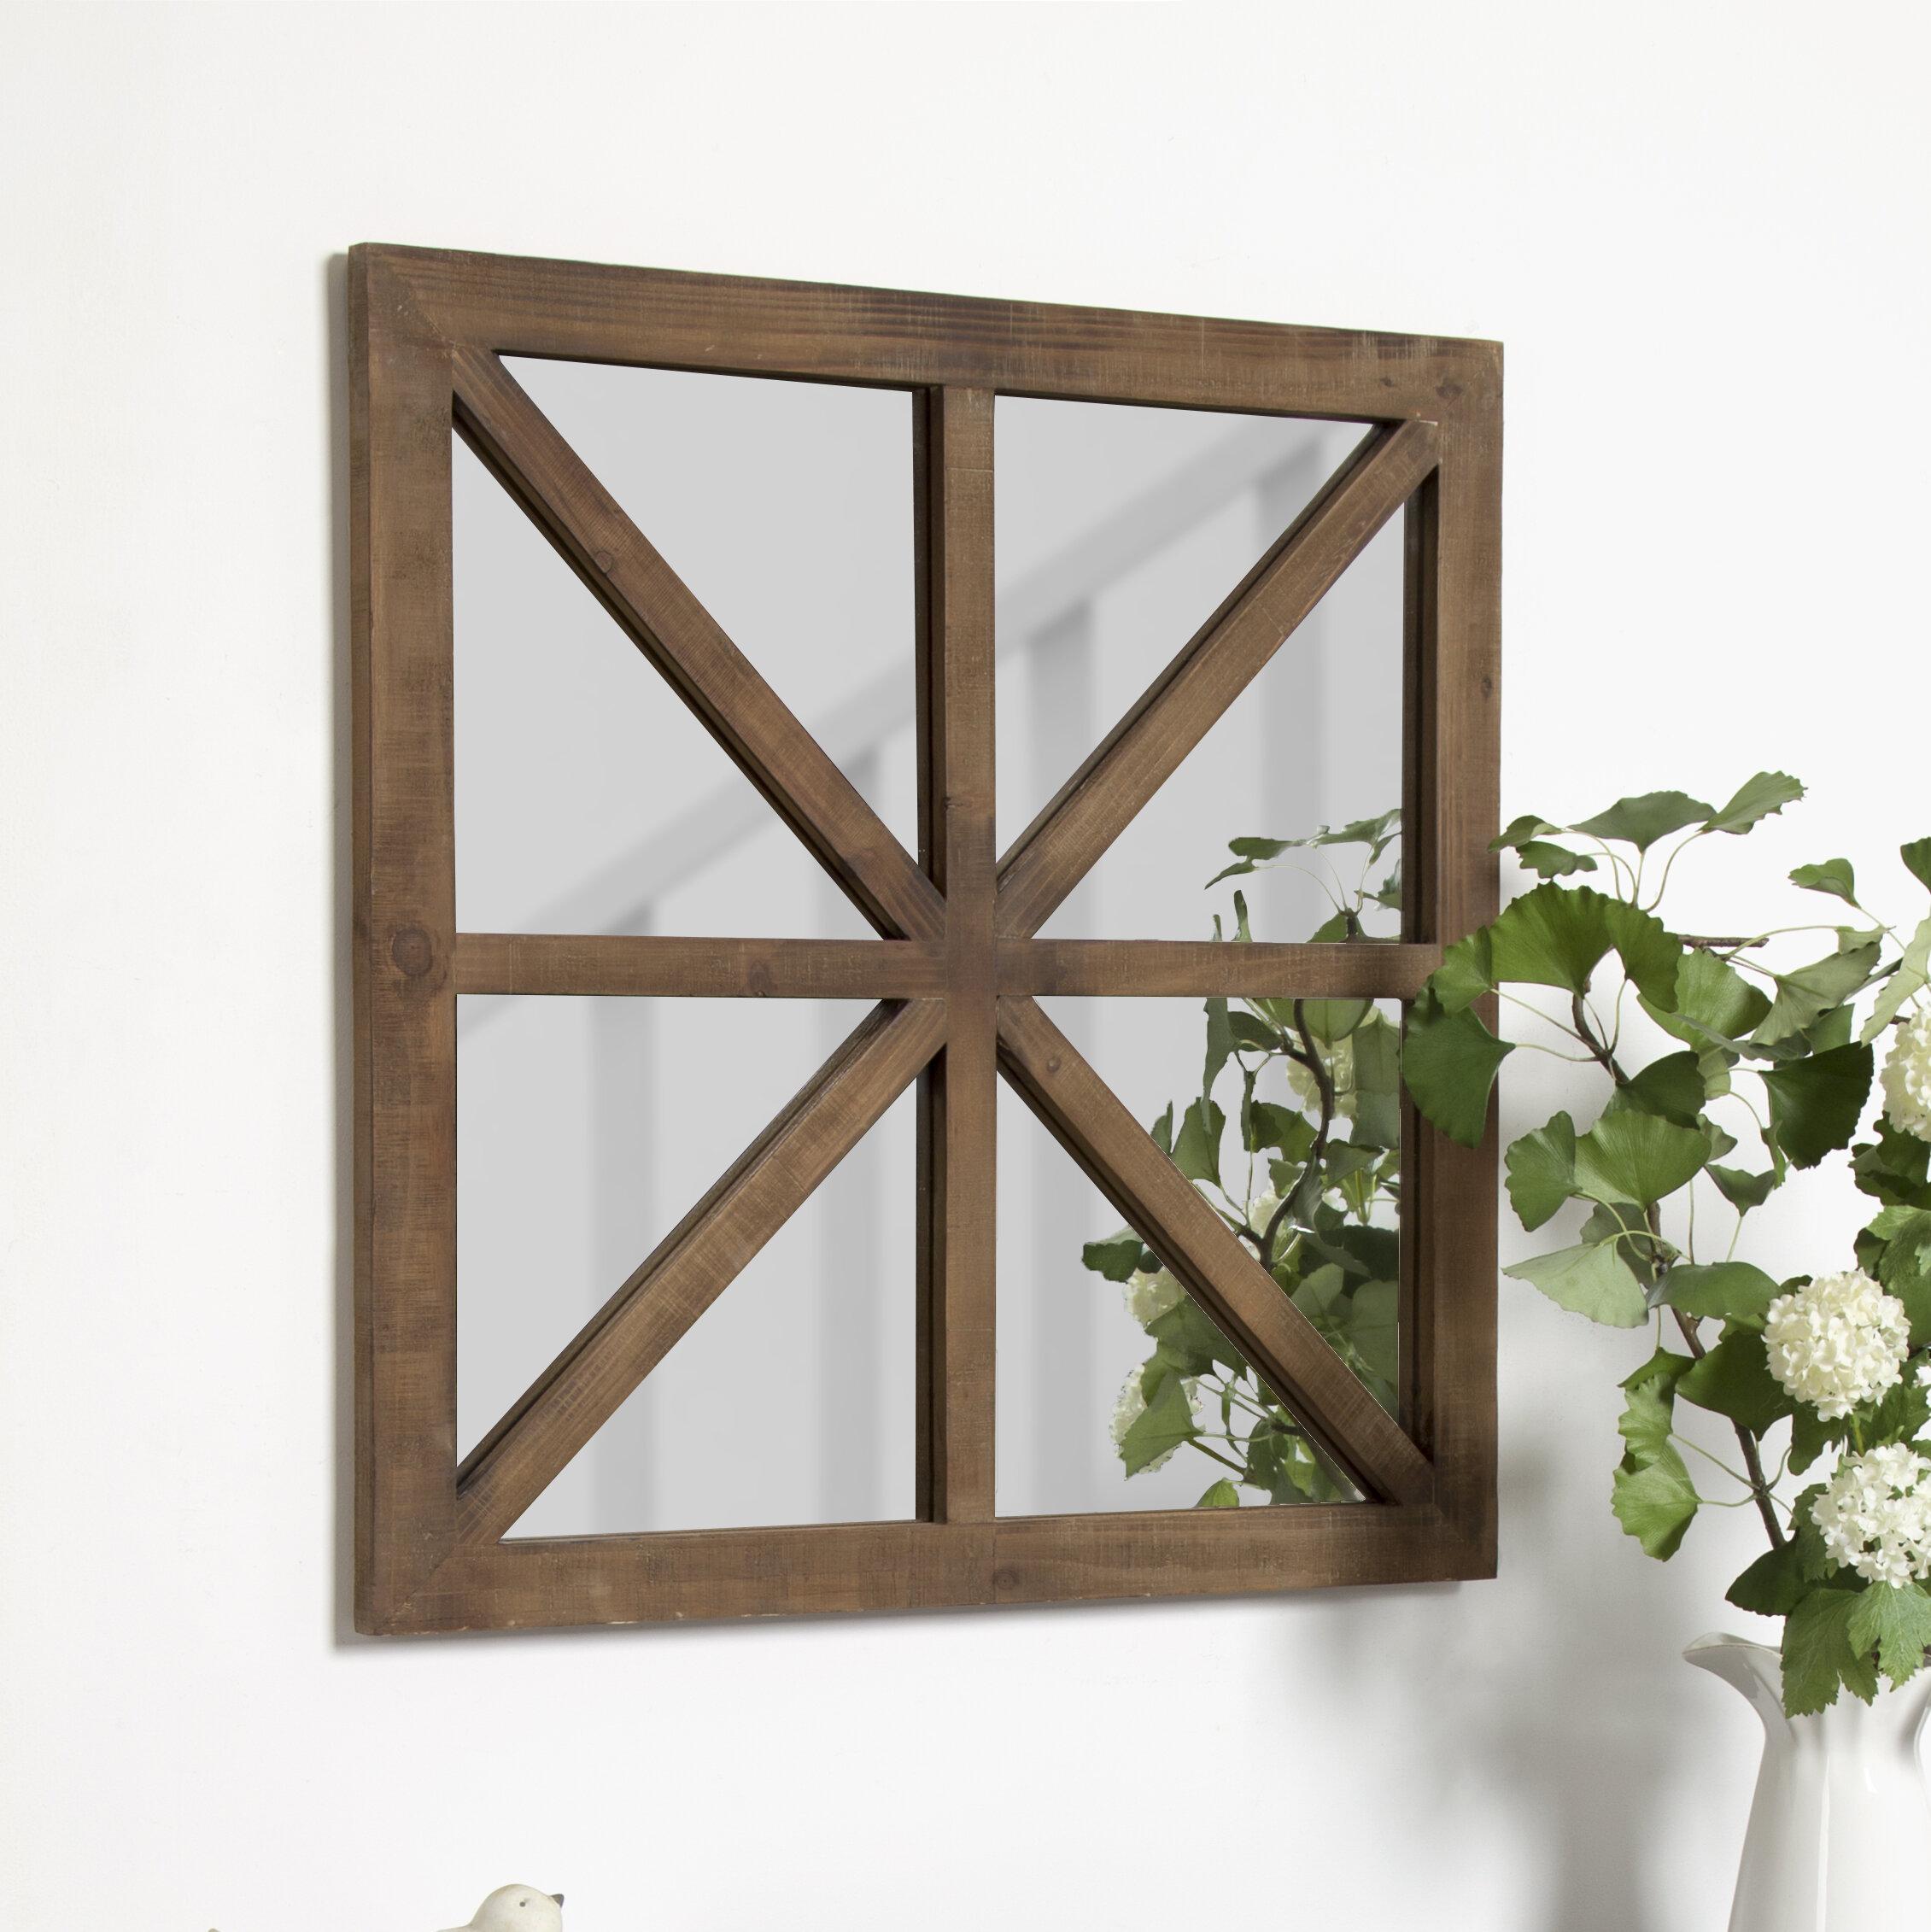 Gracie Oaks Thadine Decorative Square Windowpane Wooden Overmantel Mirror Wayfair